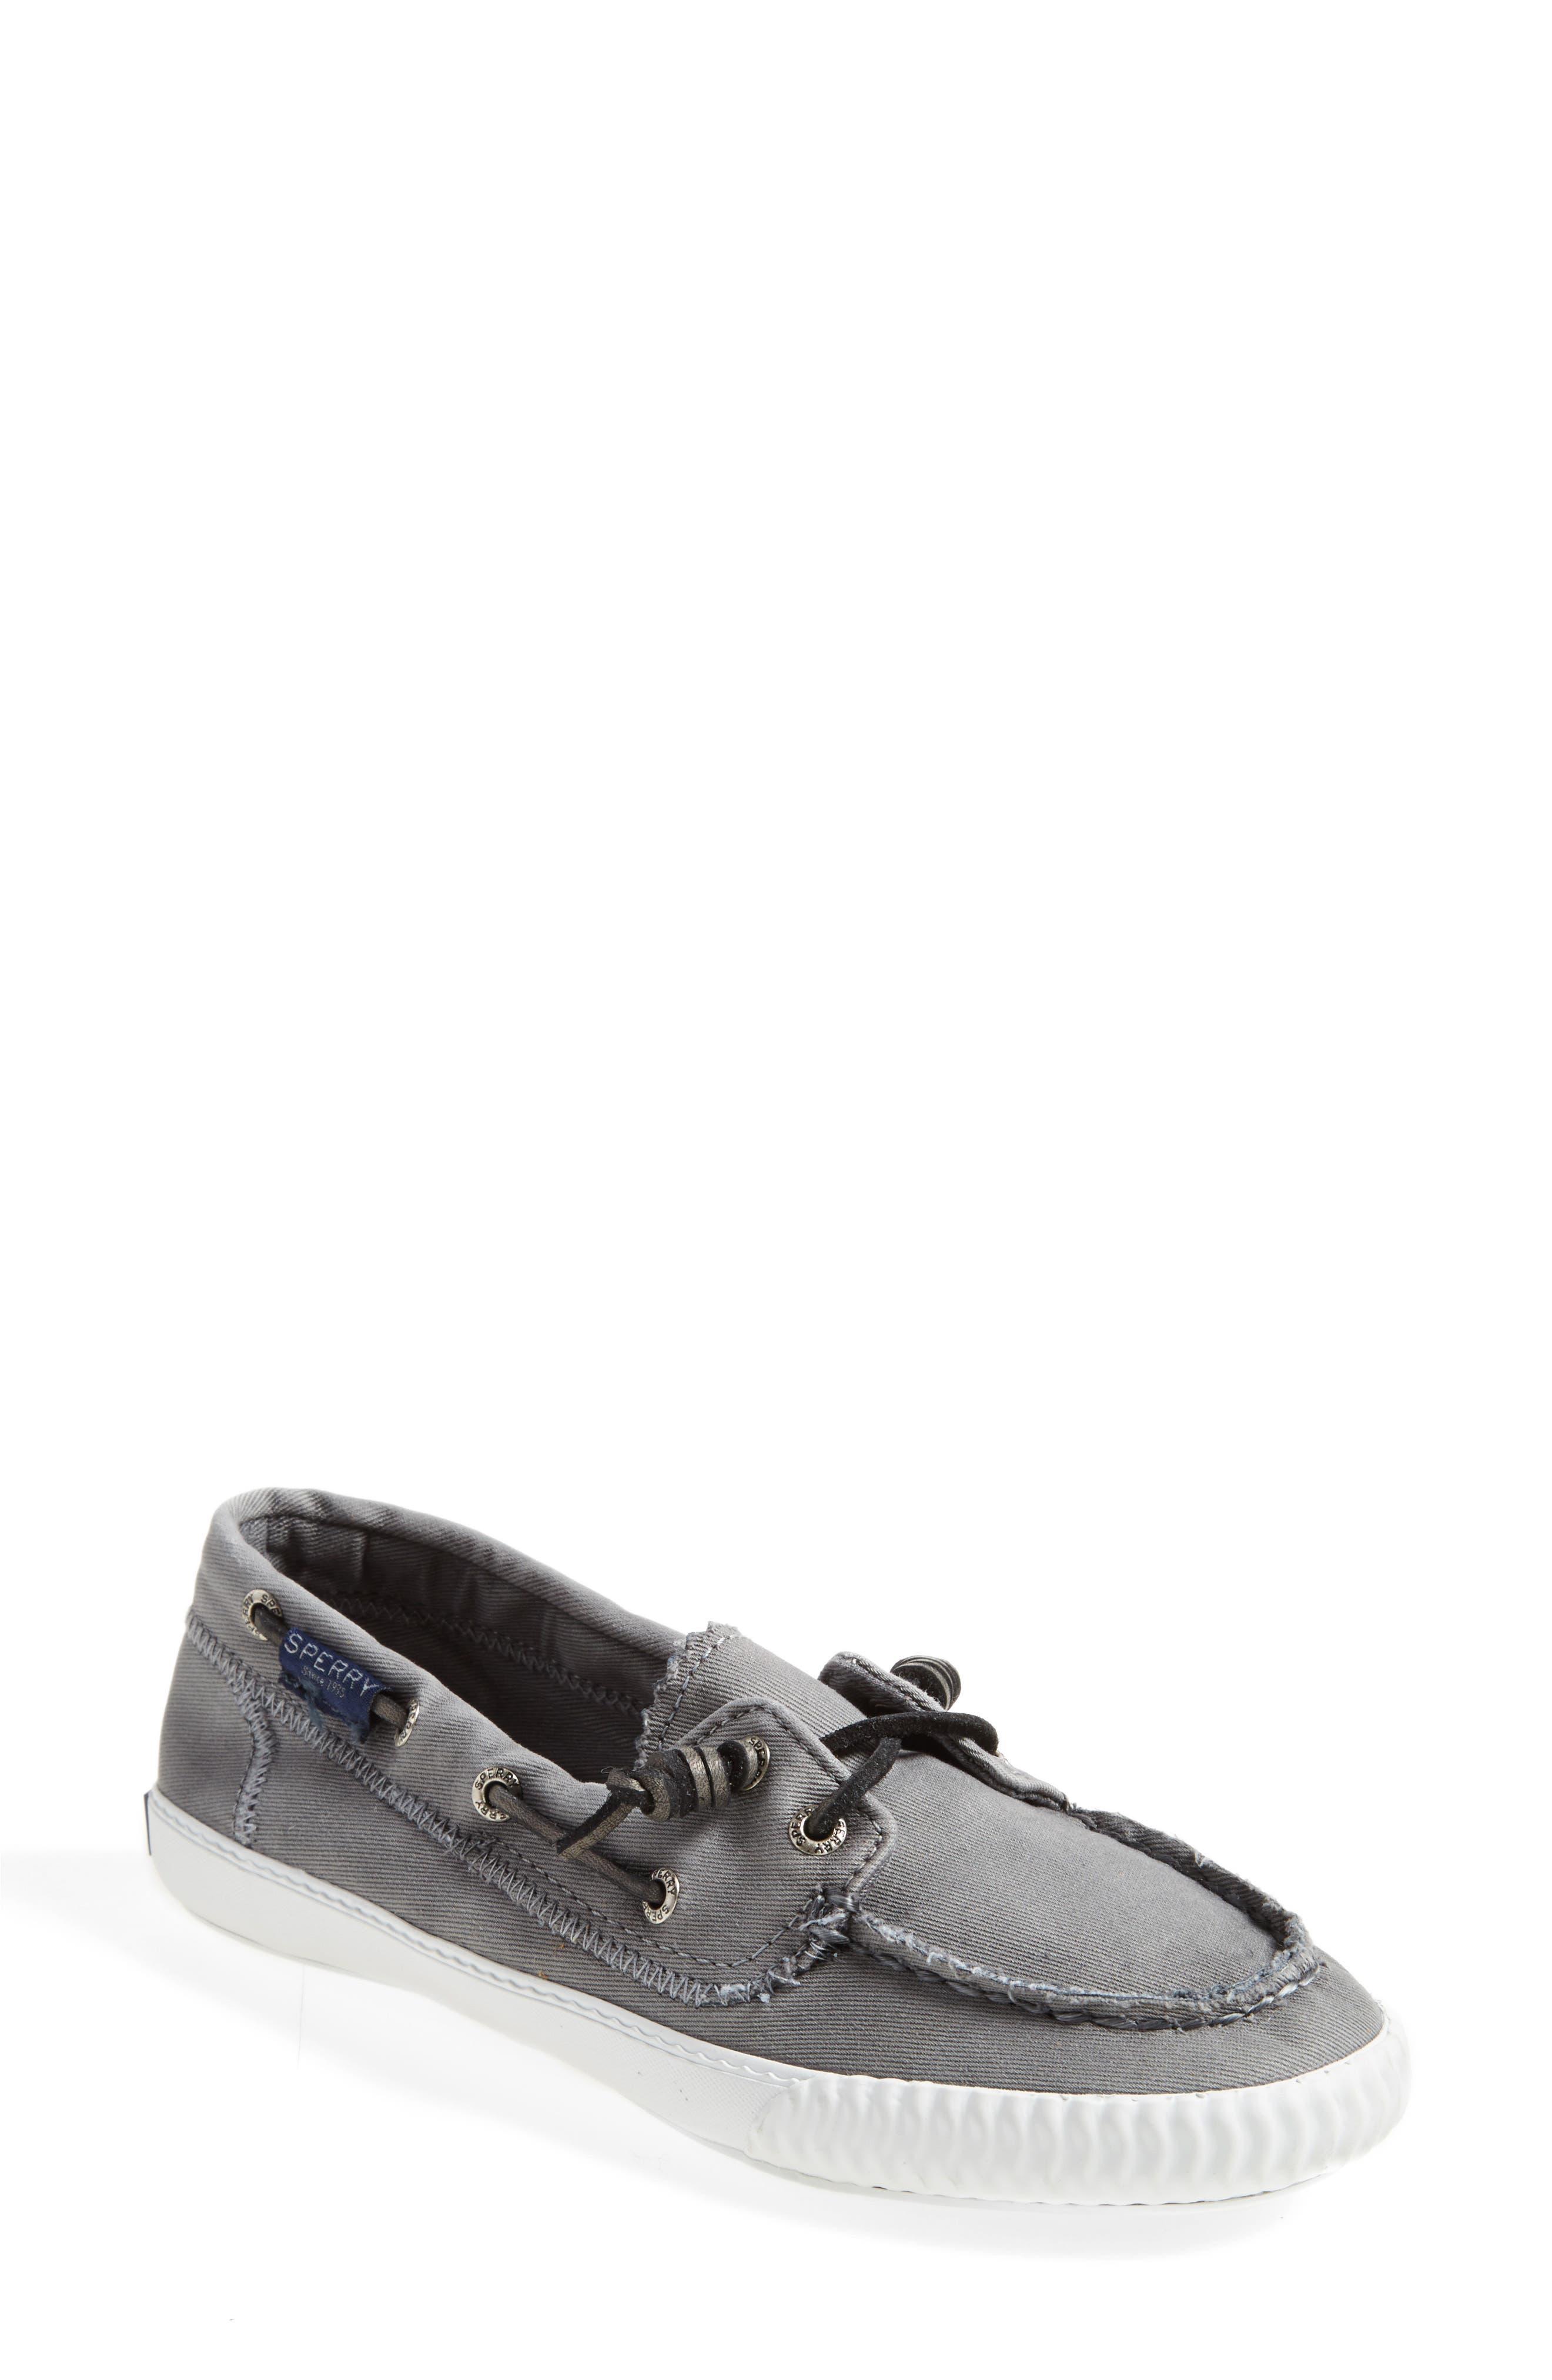 Paul Sperry 'Sayel Away' Sneaker,                             Alternate thumbnail 5, color,                             GREY